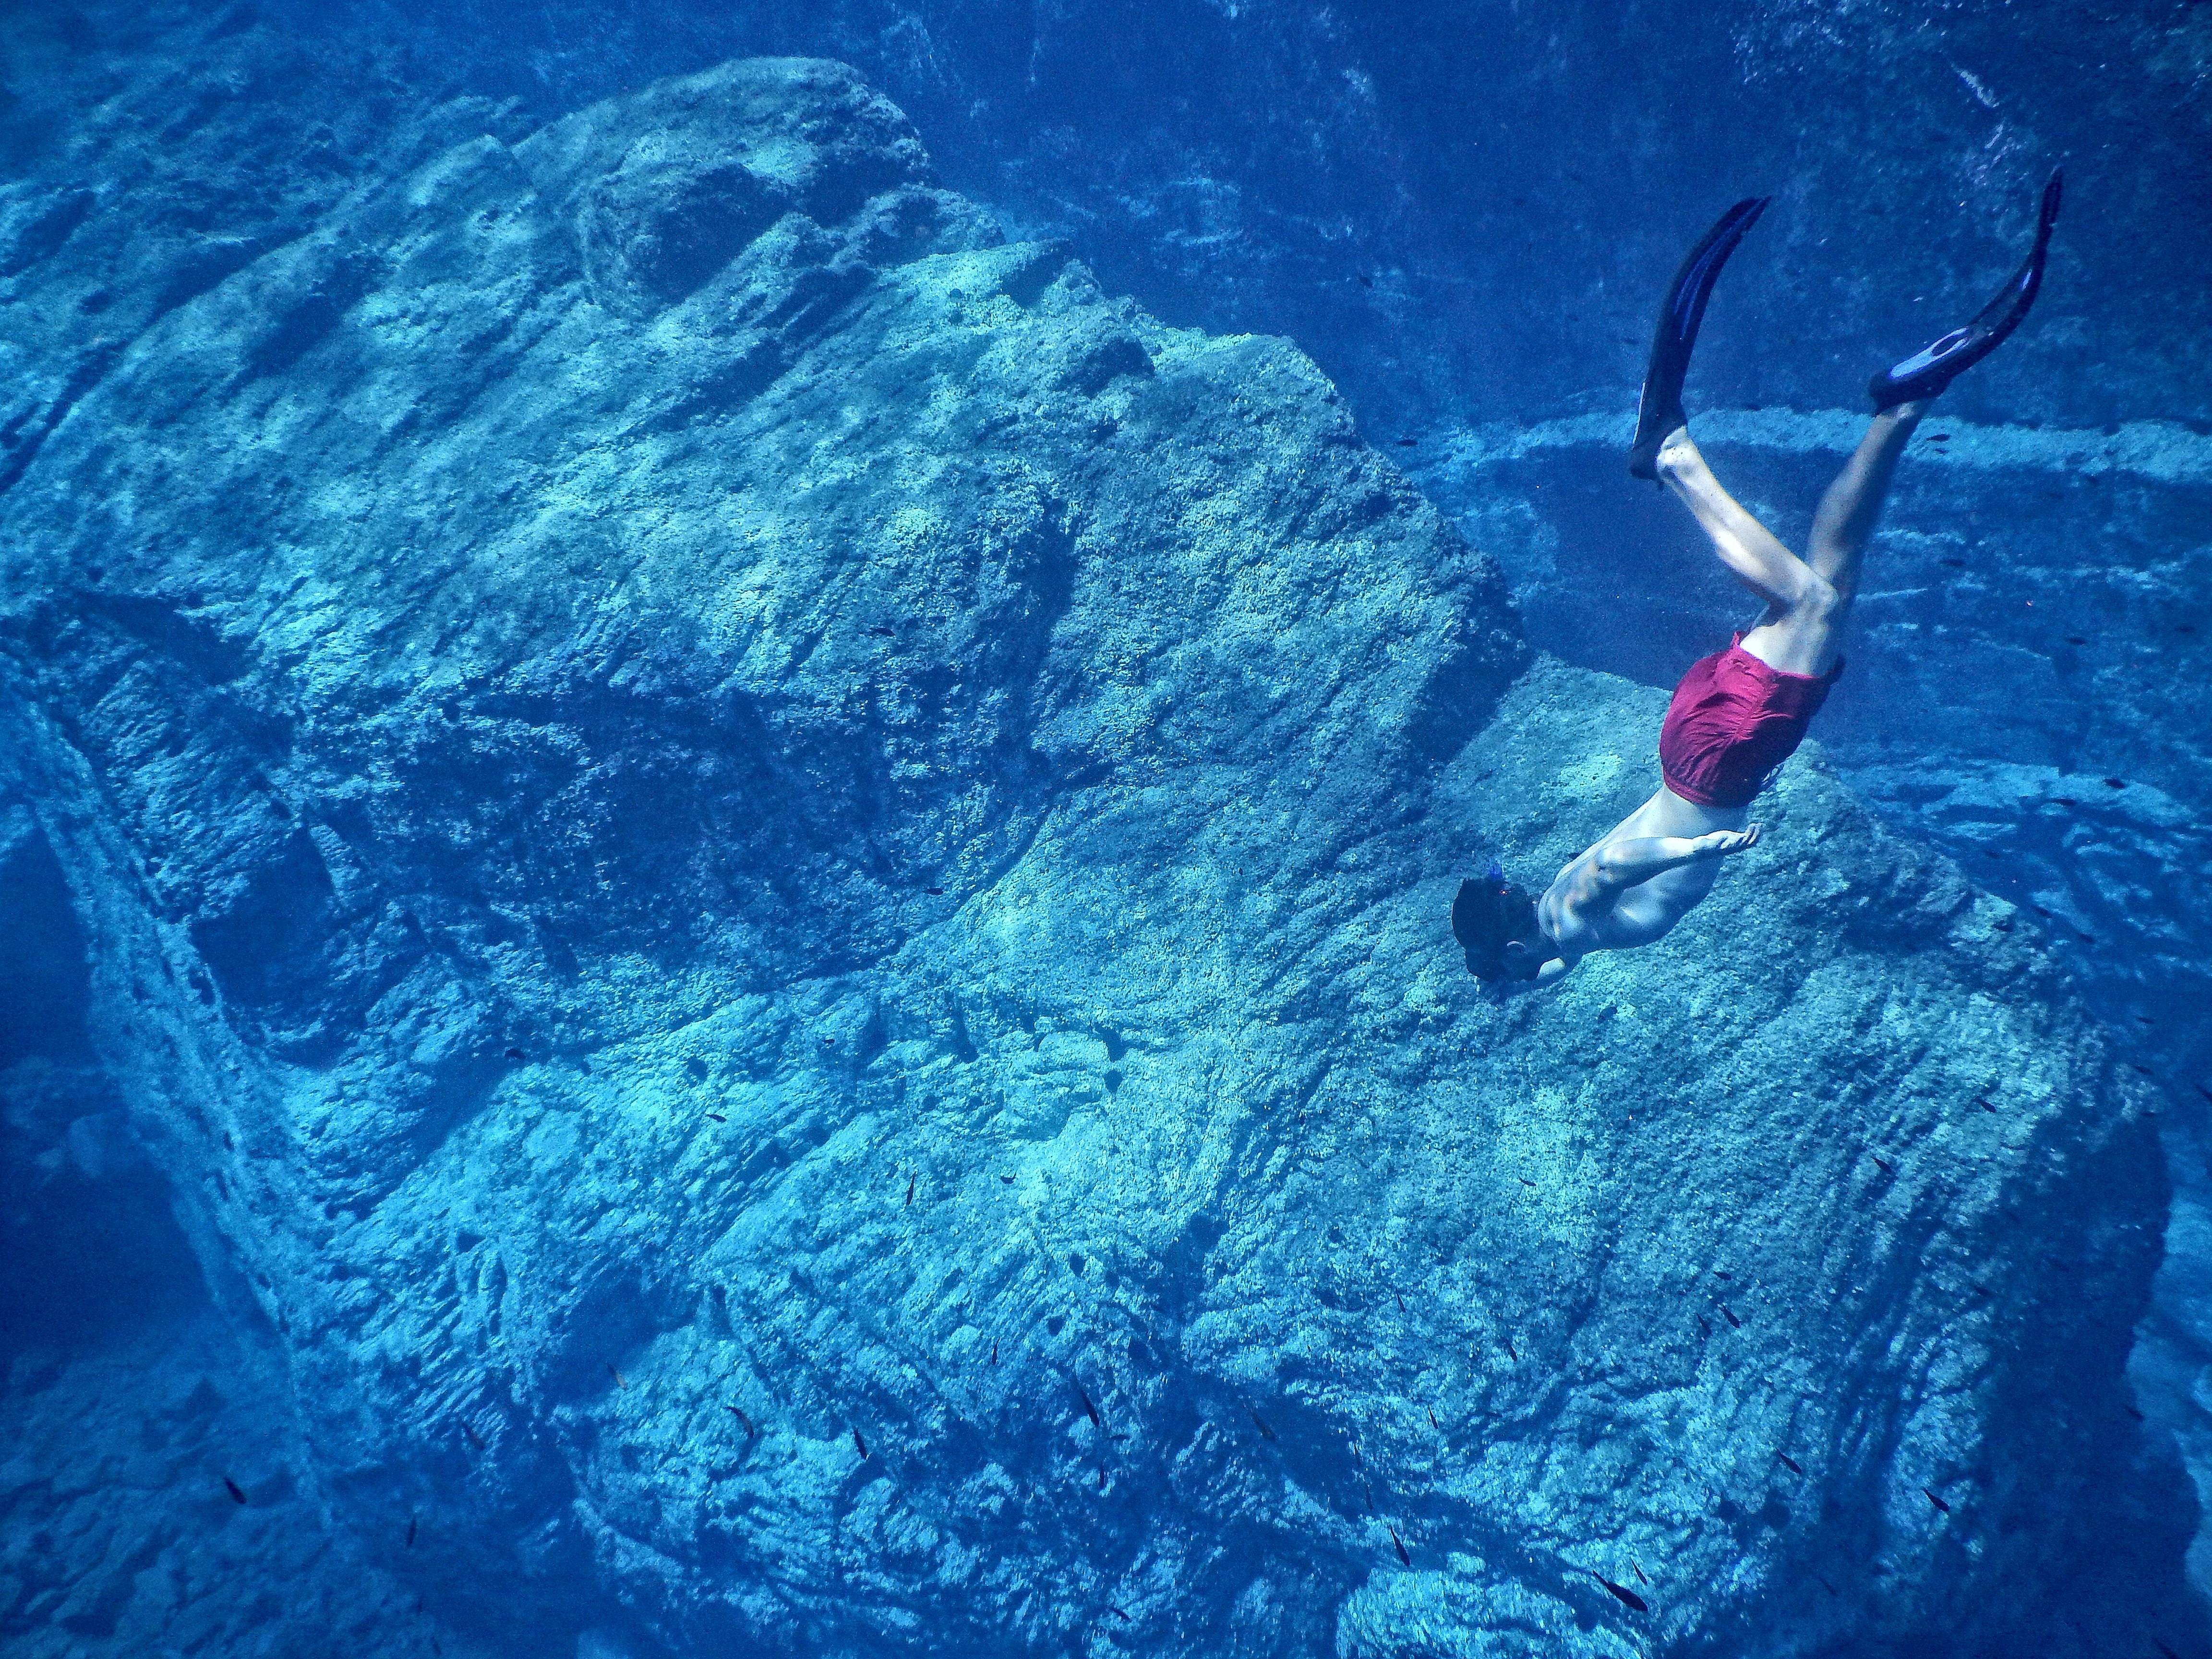 Subea's Easy Breath Full Face Snorkeling